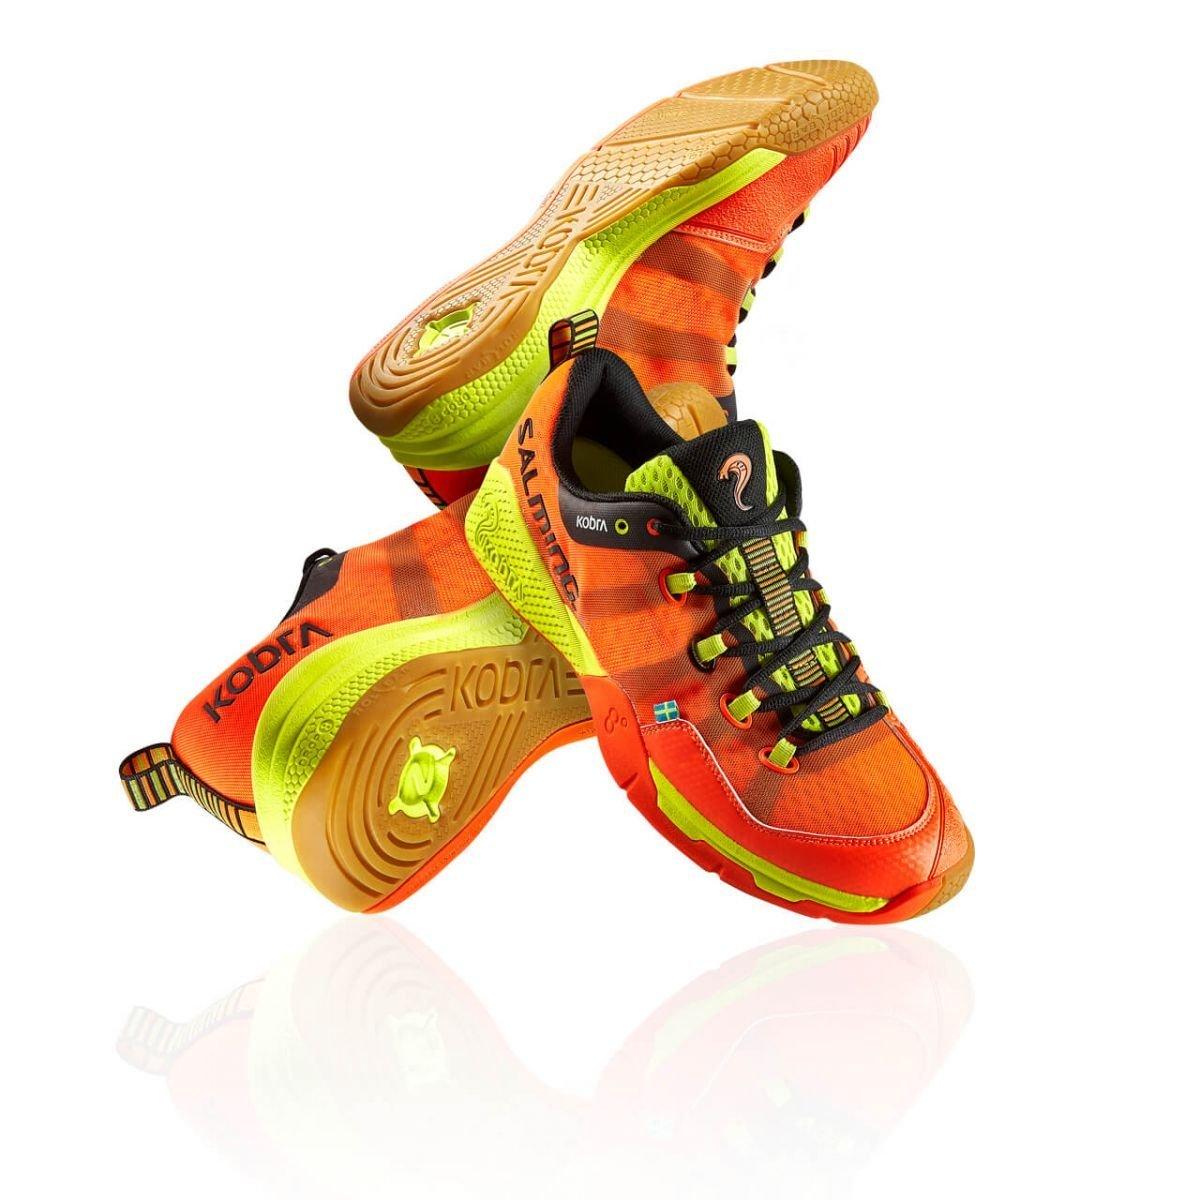 Salming Kobra Mens Squash Shoes (14, Magma Red/Black)